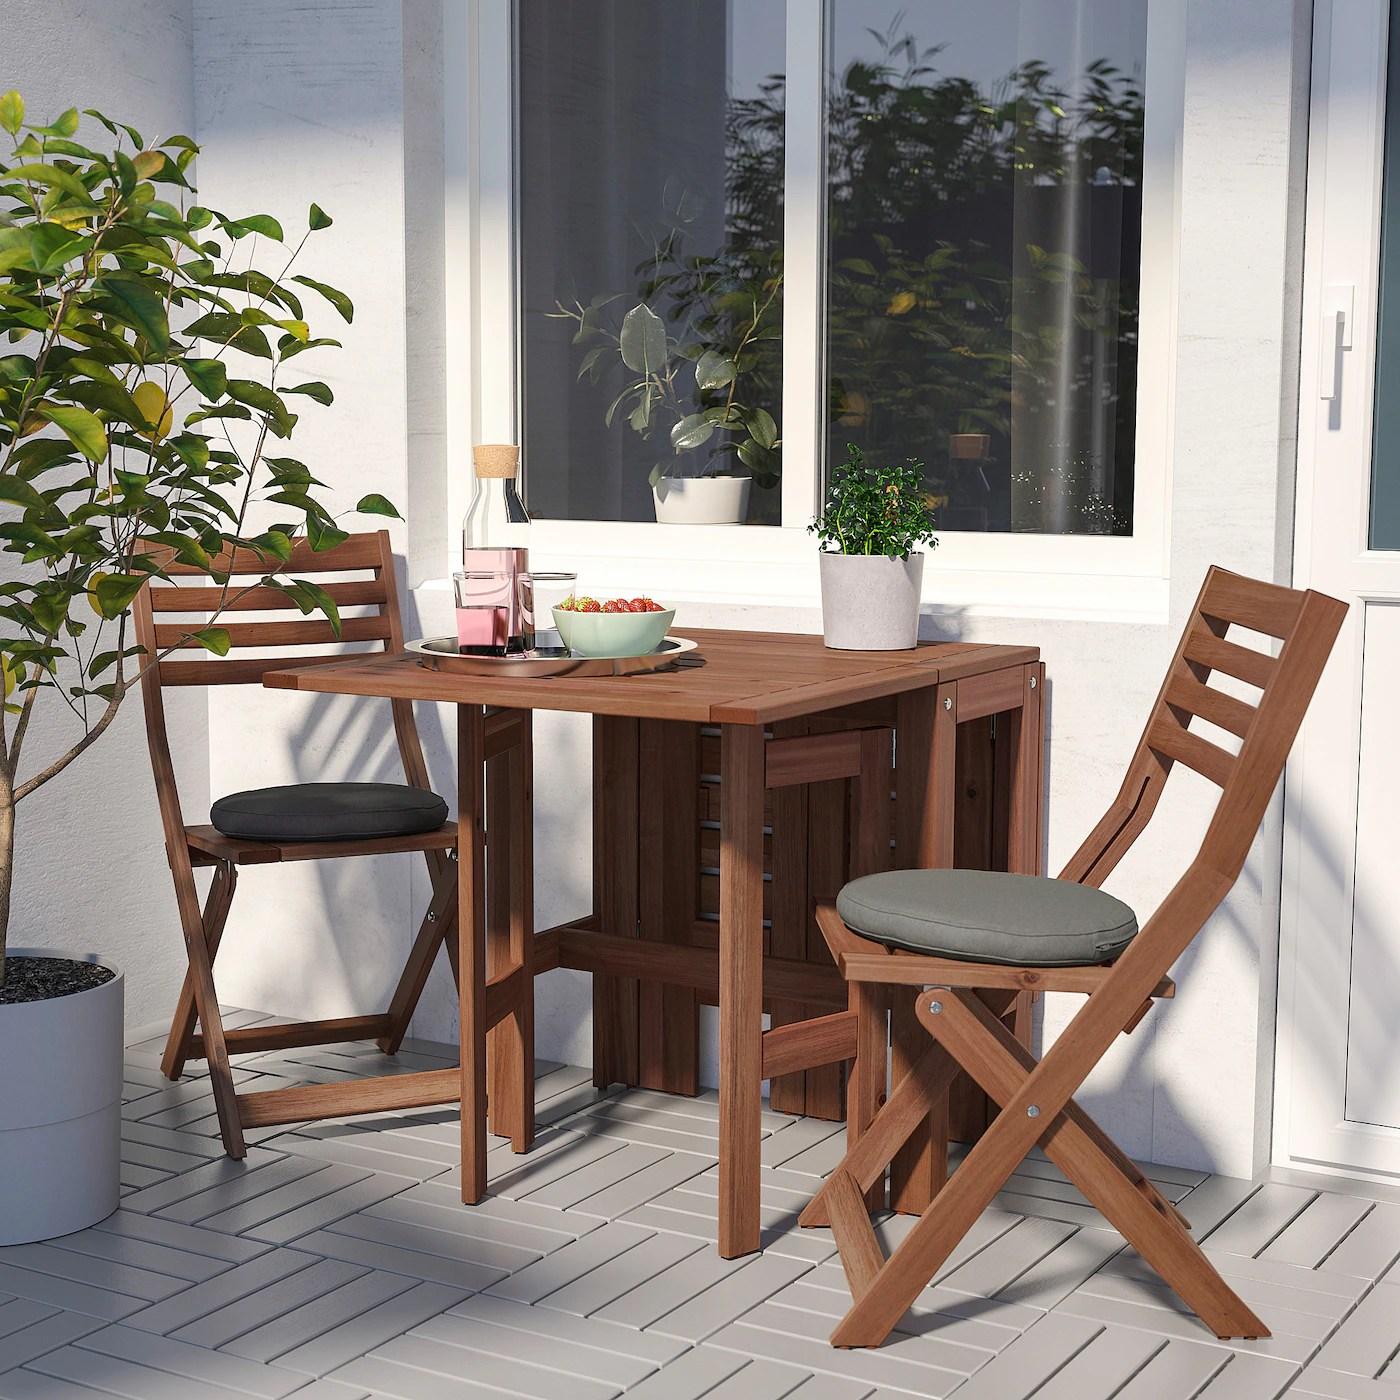 applaro table pliante exterieur teinte brun 34 83 131x70 cm